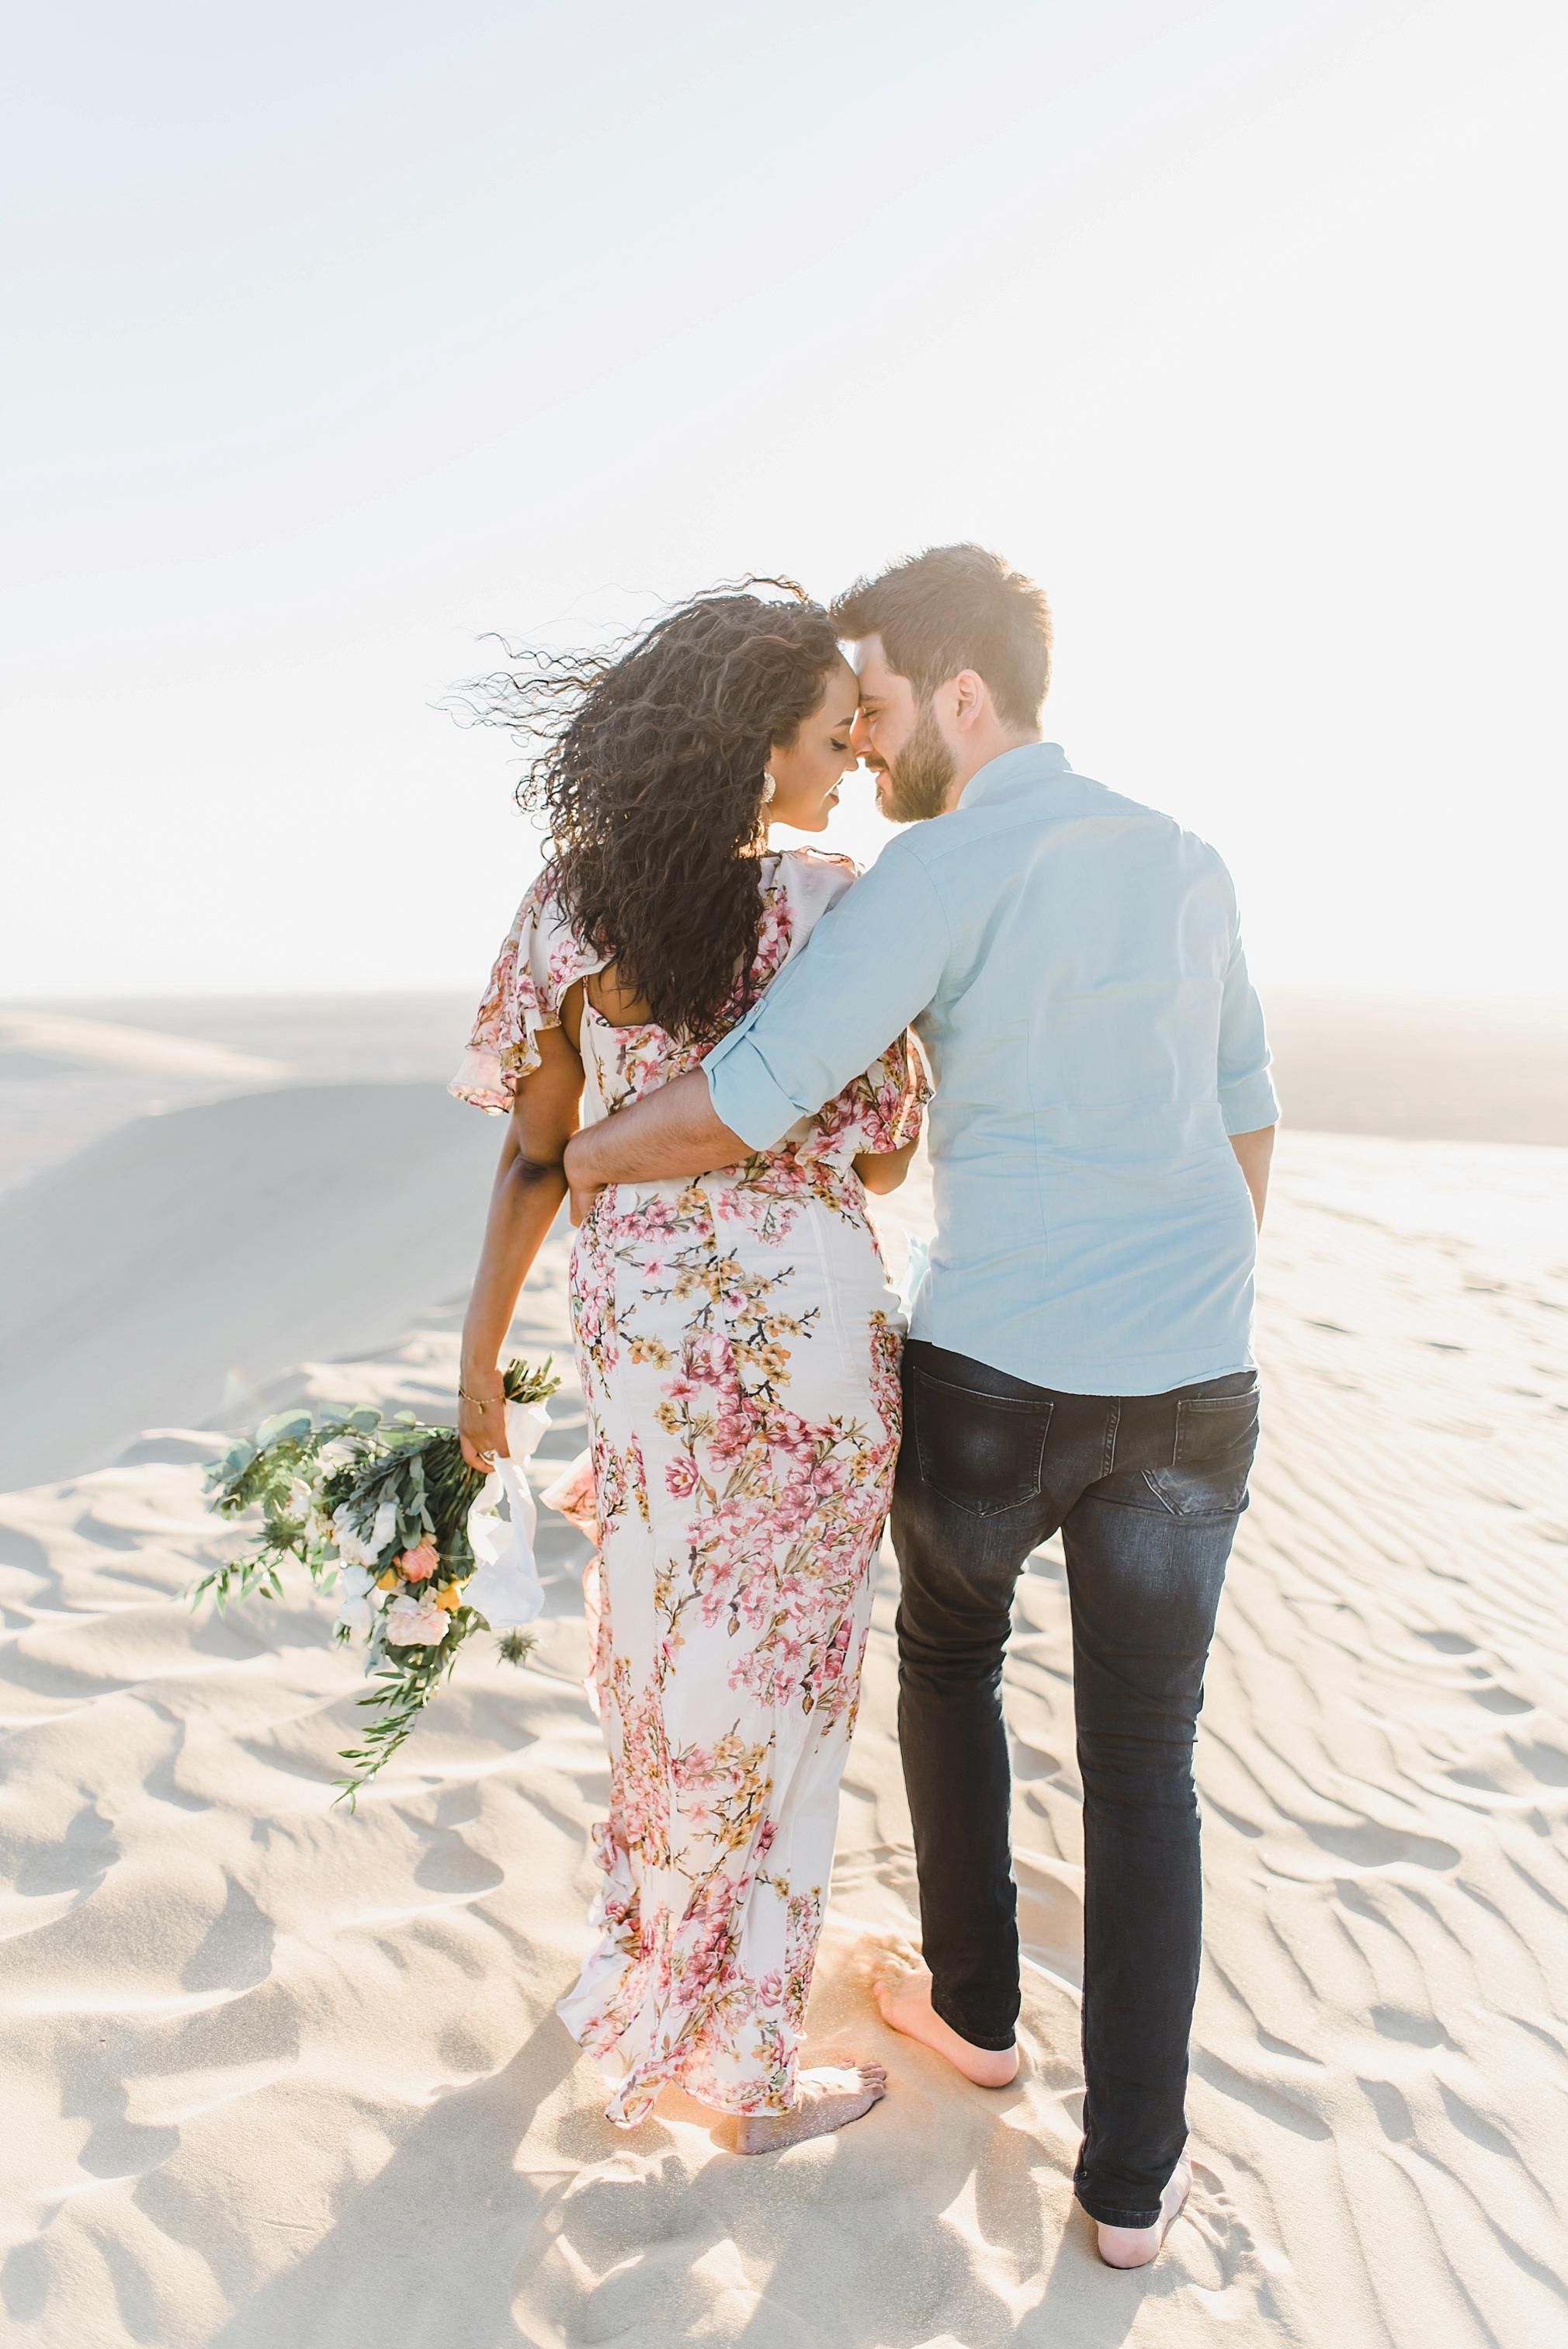 Singing Sand Dunes Desert Love Shoot   Ali and Batoul Photography_0045.jpg